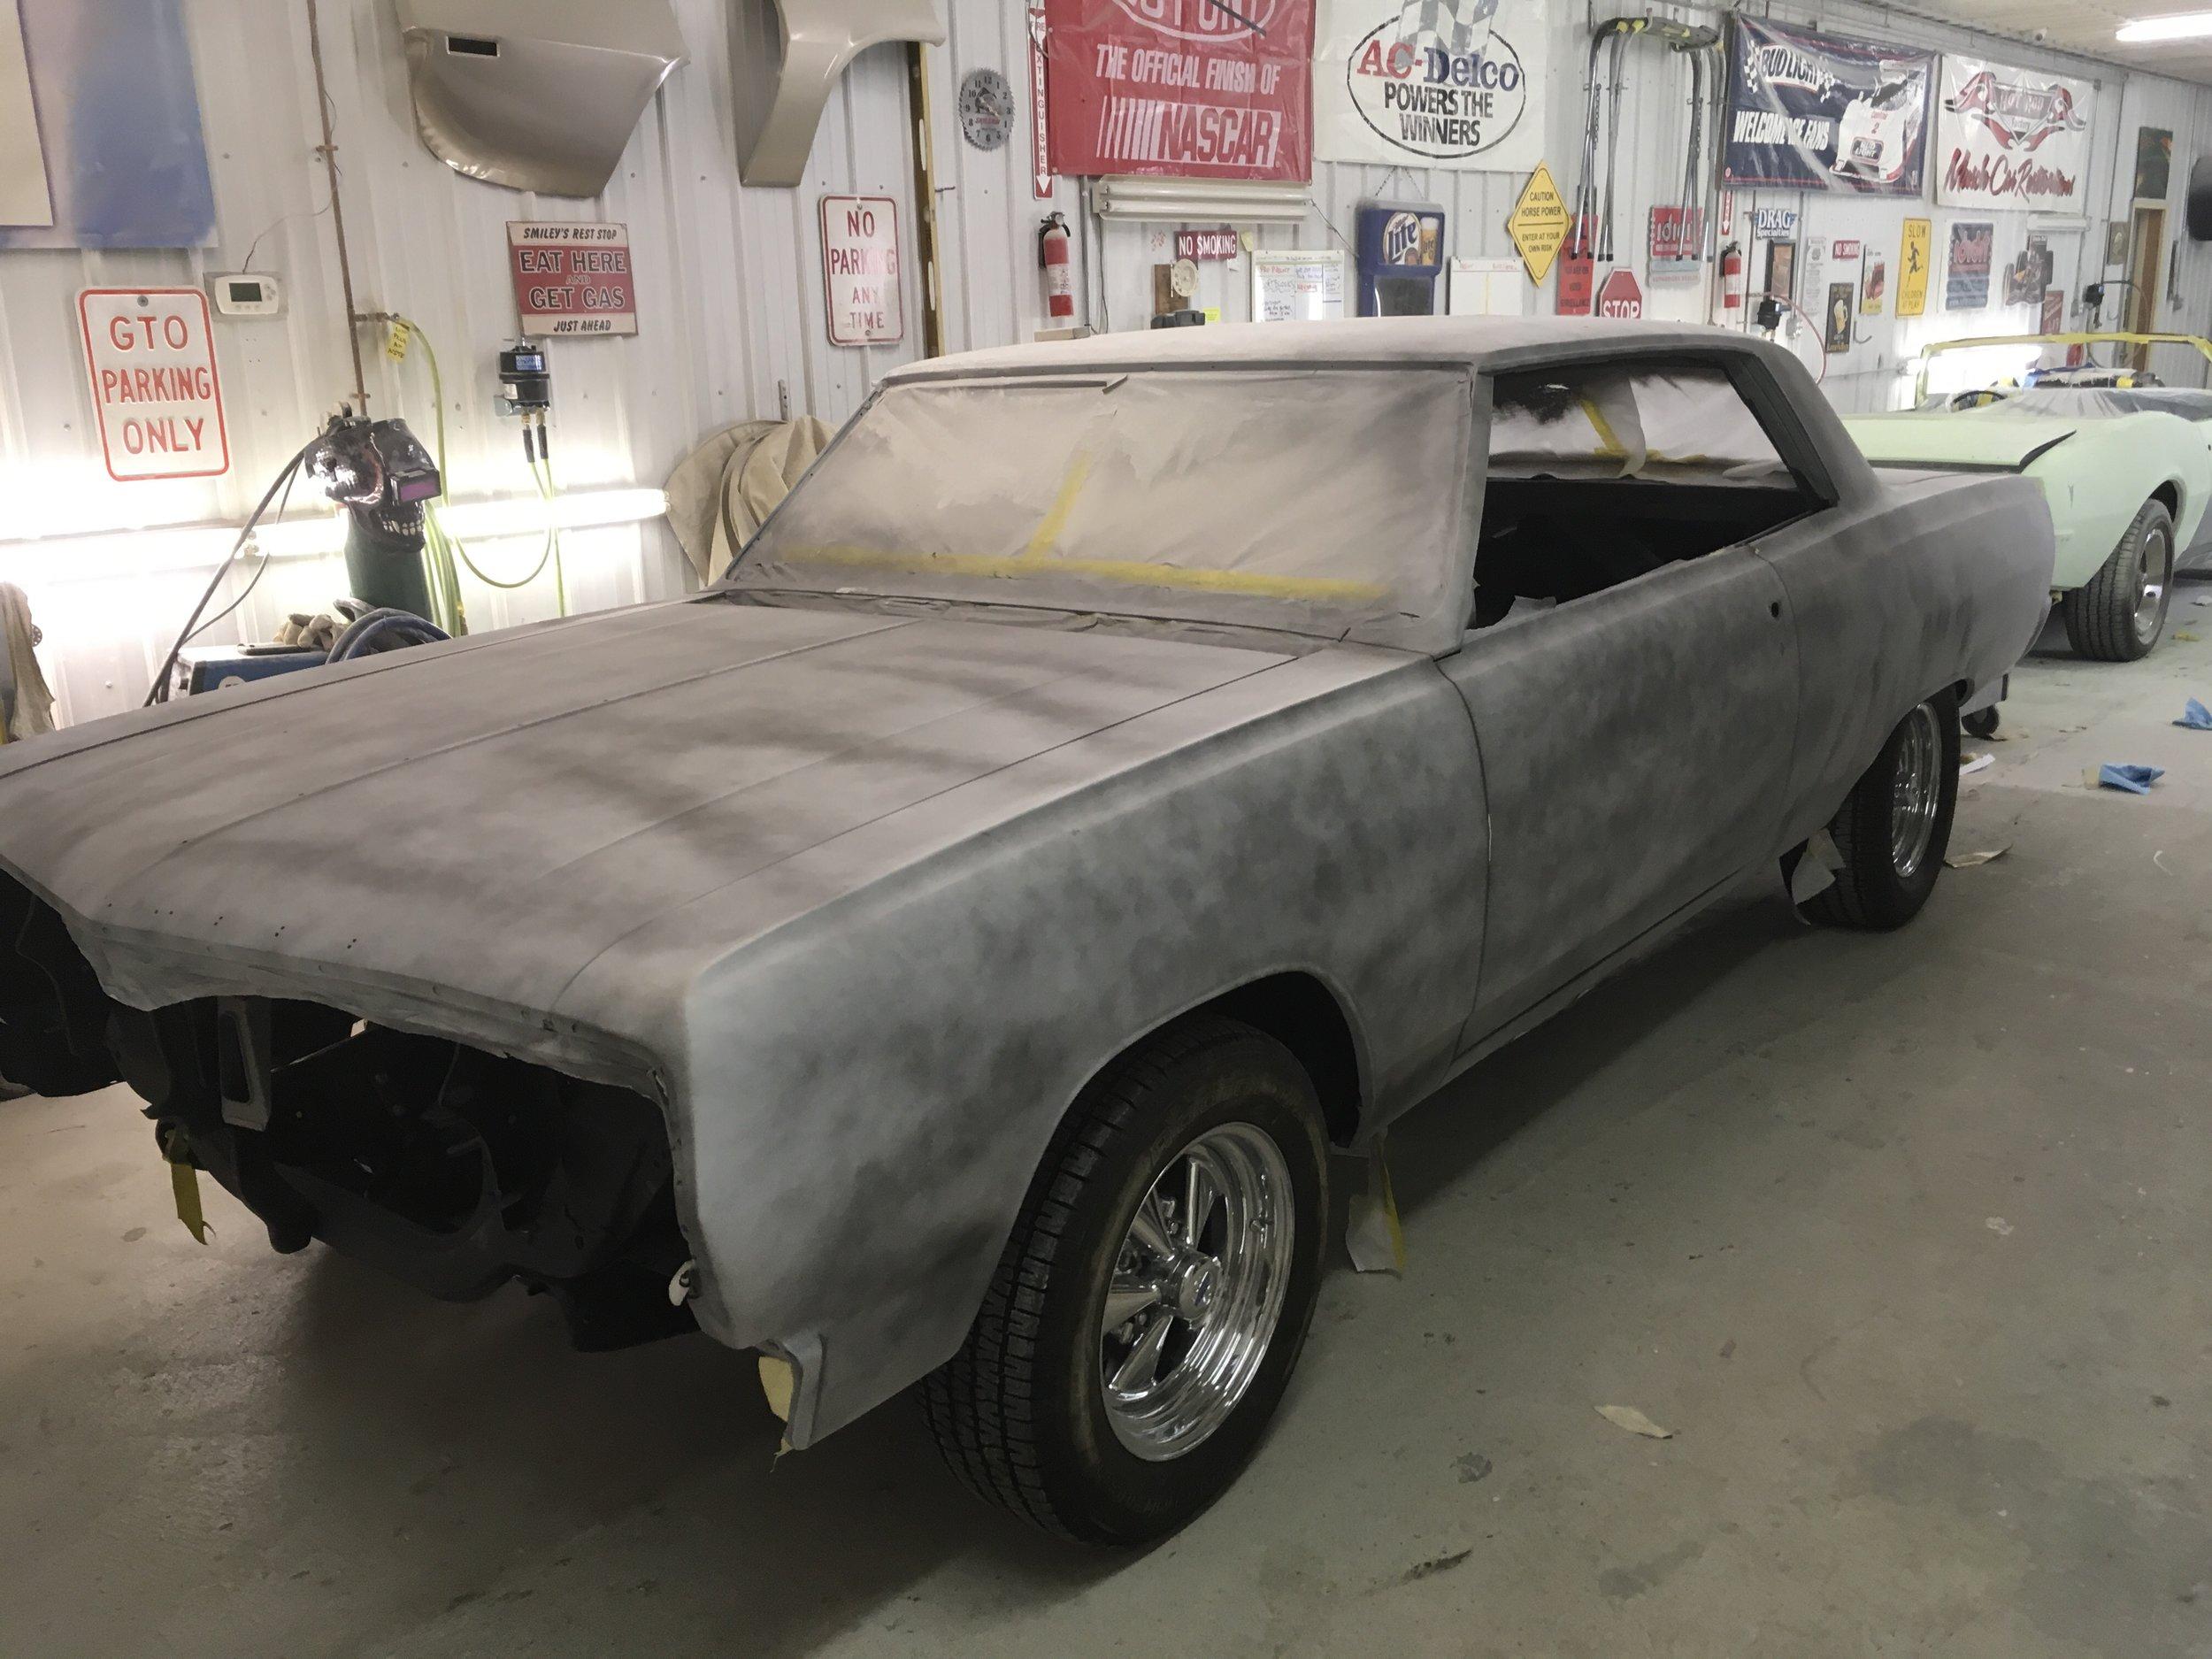 65-chevelle-body-work-minneapolis-custom-hot-rod-car-restoration-hot-rod-factory.jpg